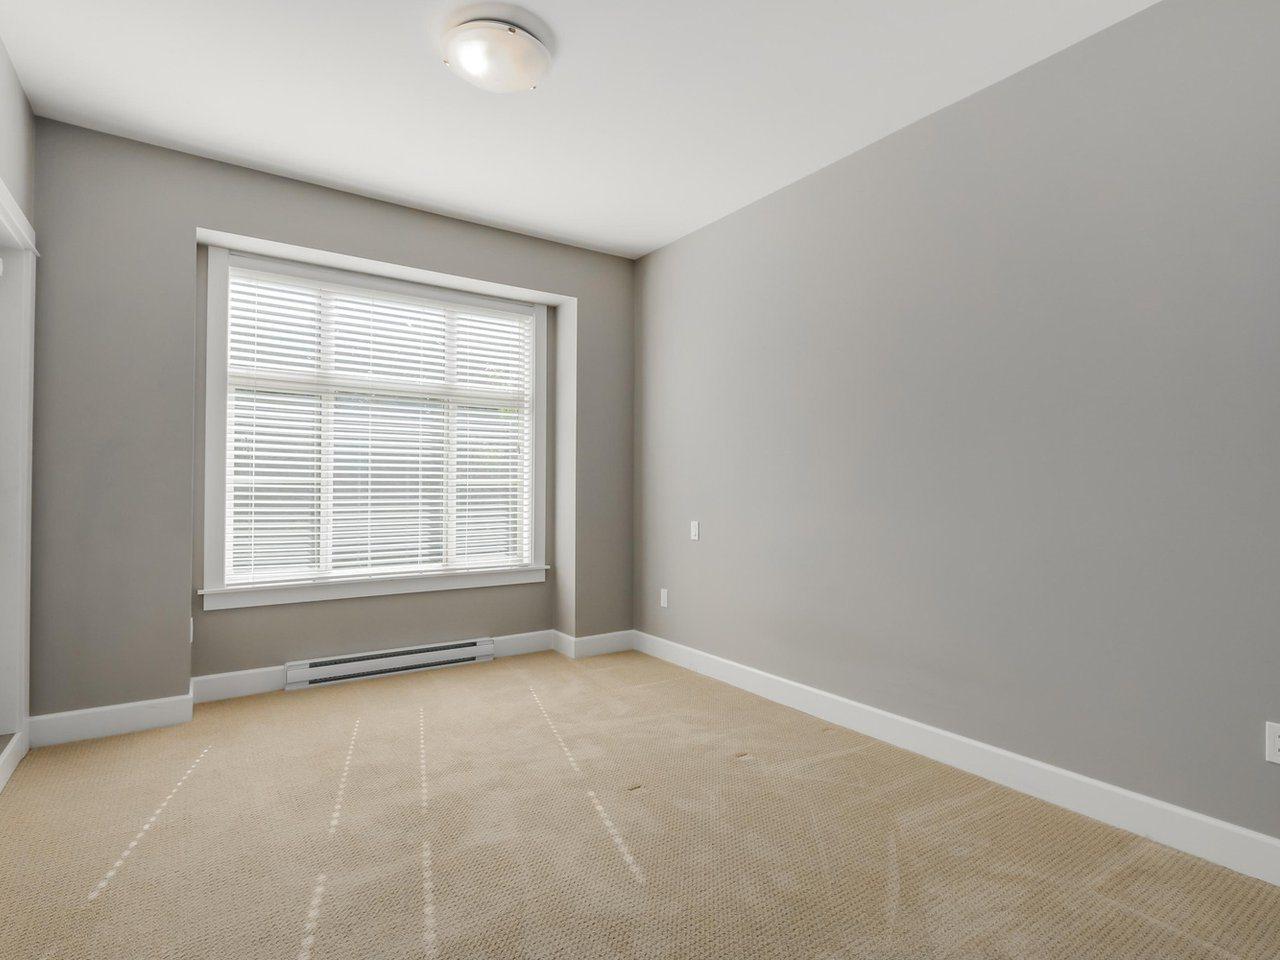 Condo Apartment at 206 15185 36 AVENUE, Unit 206, South Surrey White Rock, British Columbia. Image 9